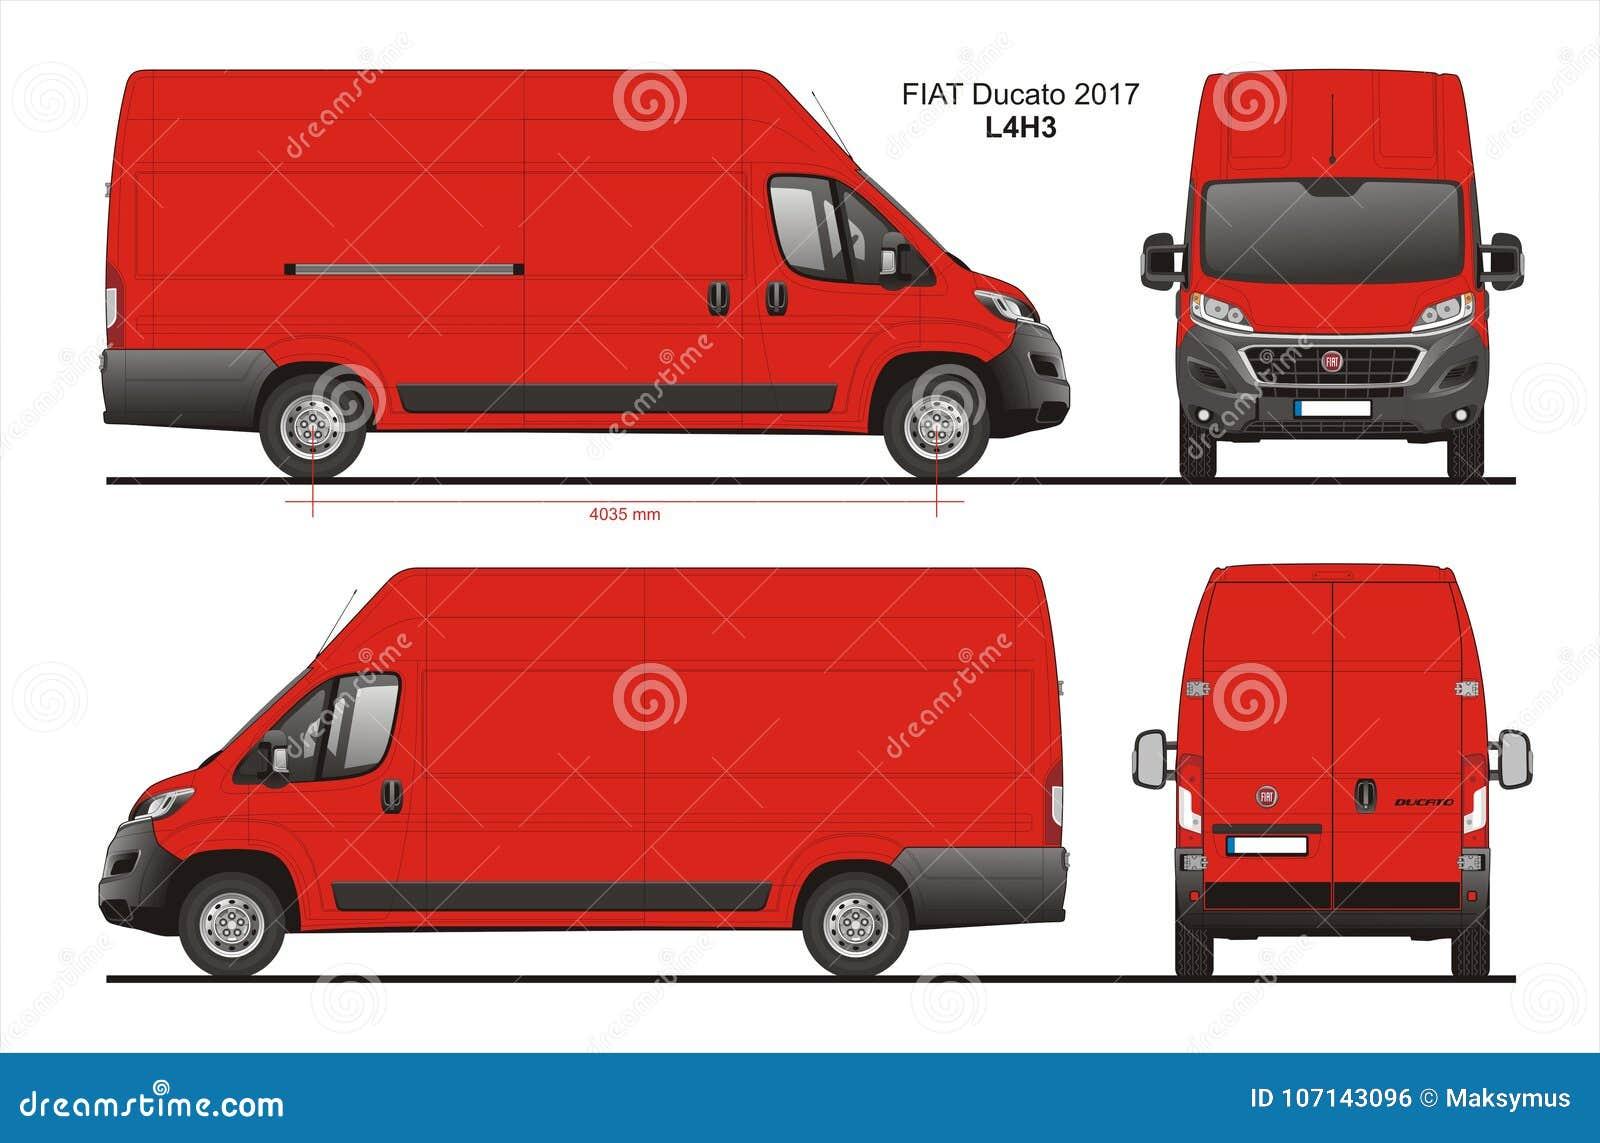 Fiat ducato cargo delivery van 2017 l4h3 blueprint editorial photo fiat ducato cargo delivery van 2017 l4h3 blueprint malvernweather Image collections